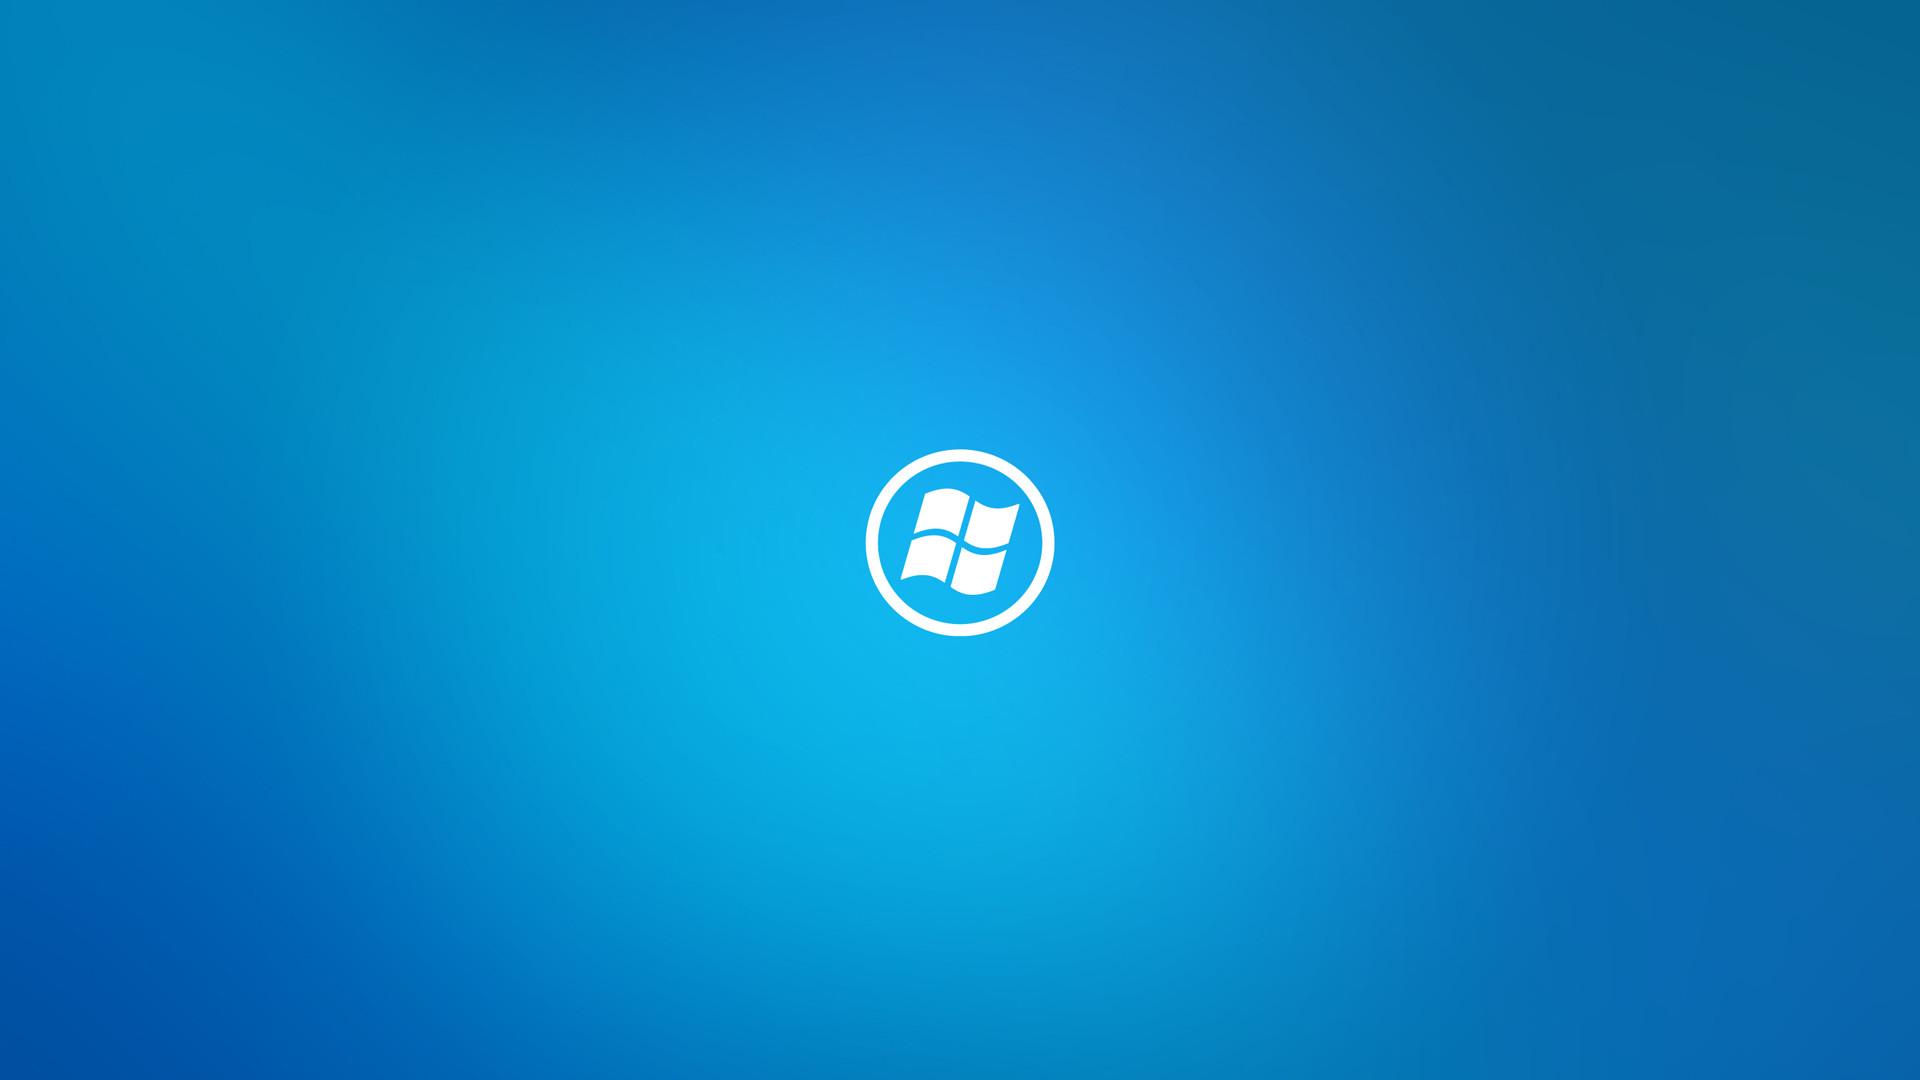 HD Wallpapers p Widescreen x Windows Best HD Desktop